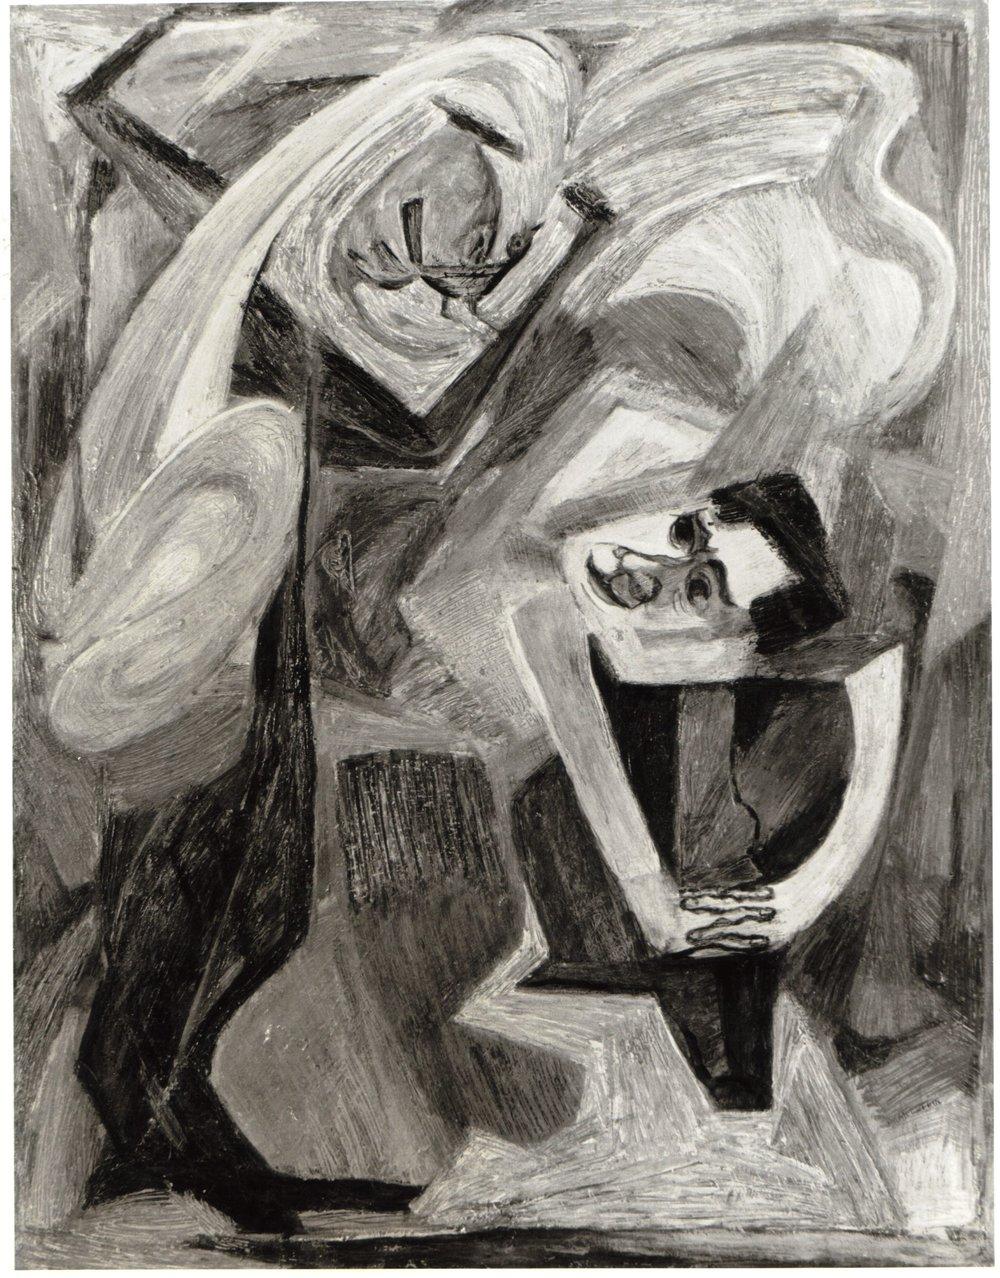 47. 1948-49 c, The Mahler Theme (The Bird's Song), Casein on masonite, 30.5x24, 1948-49.jpg